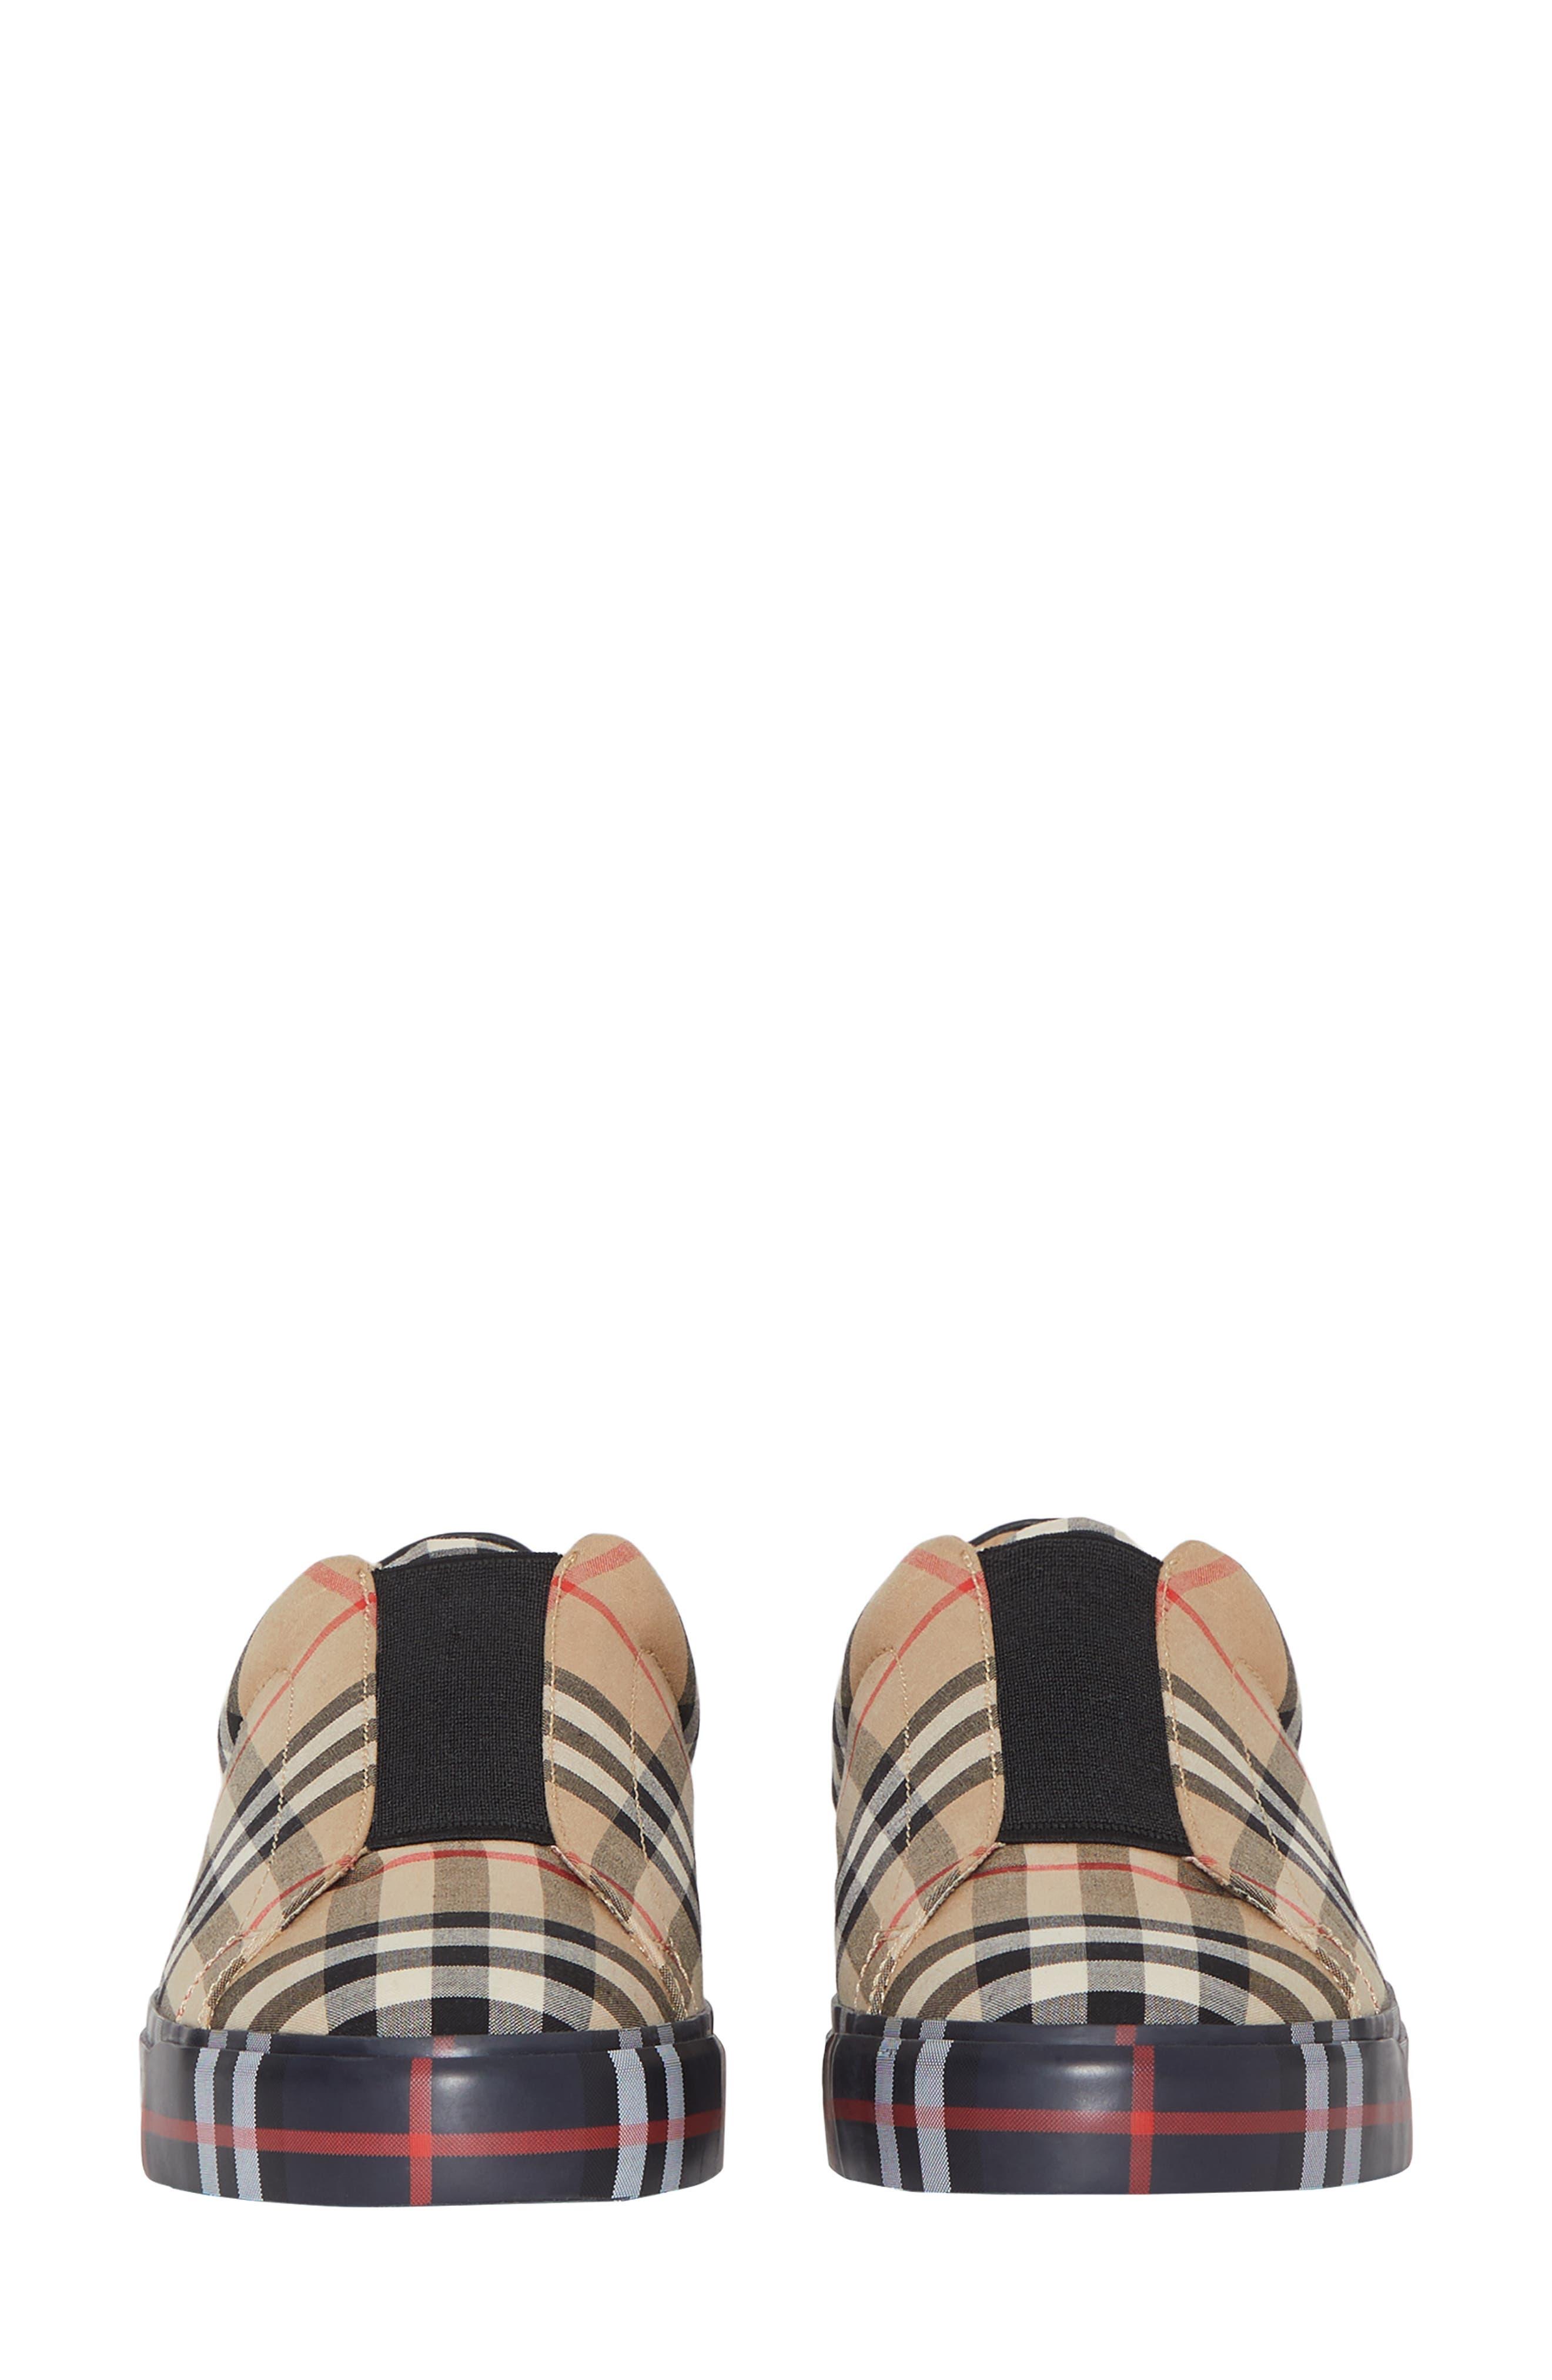 BURBERRY, Markham Vintage Check Slip-On Sneaker, Alternate thumbnail 4, color, BEIGE PLAID